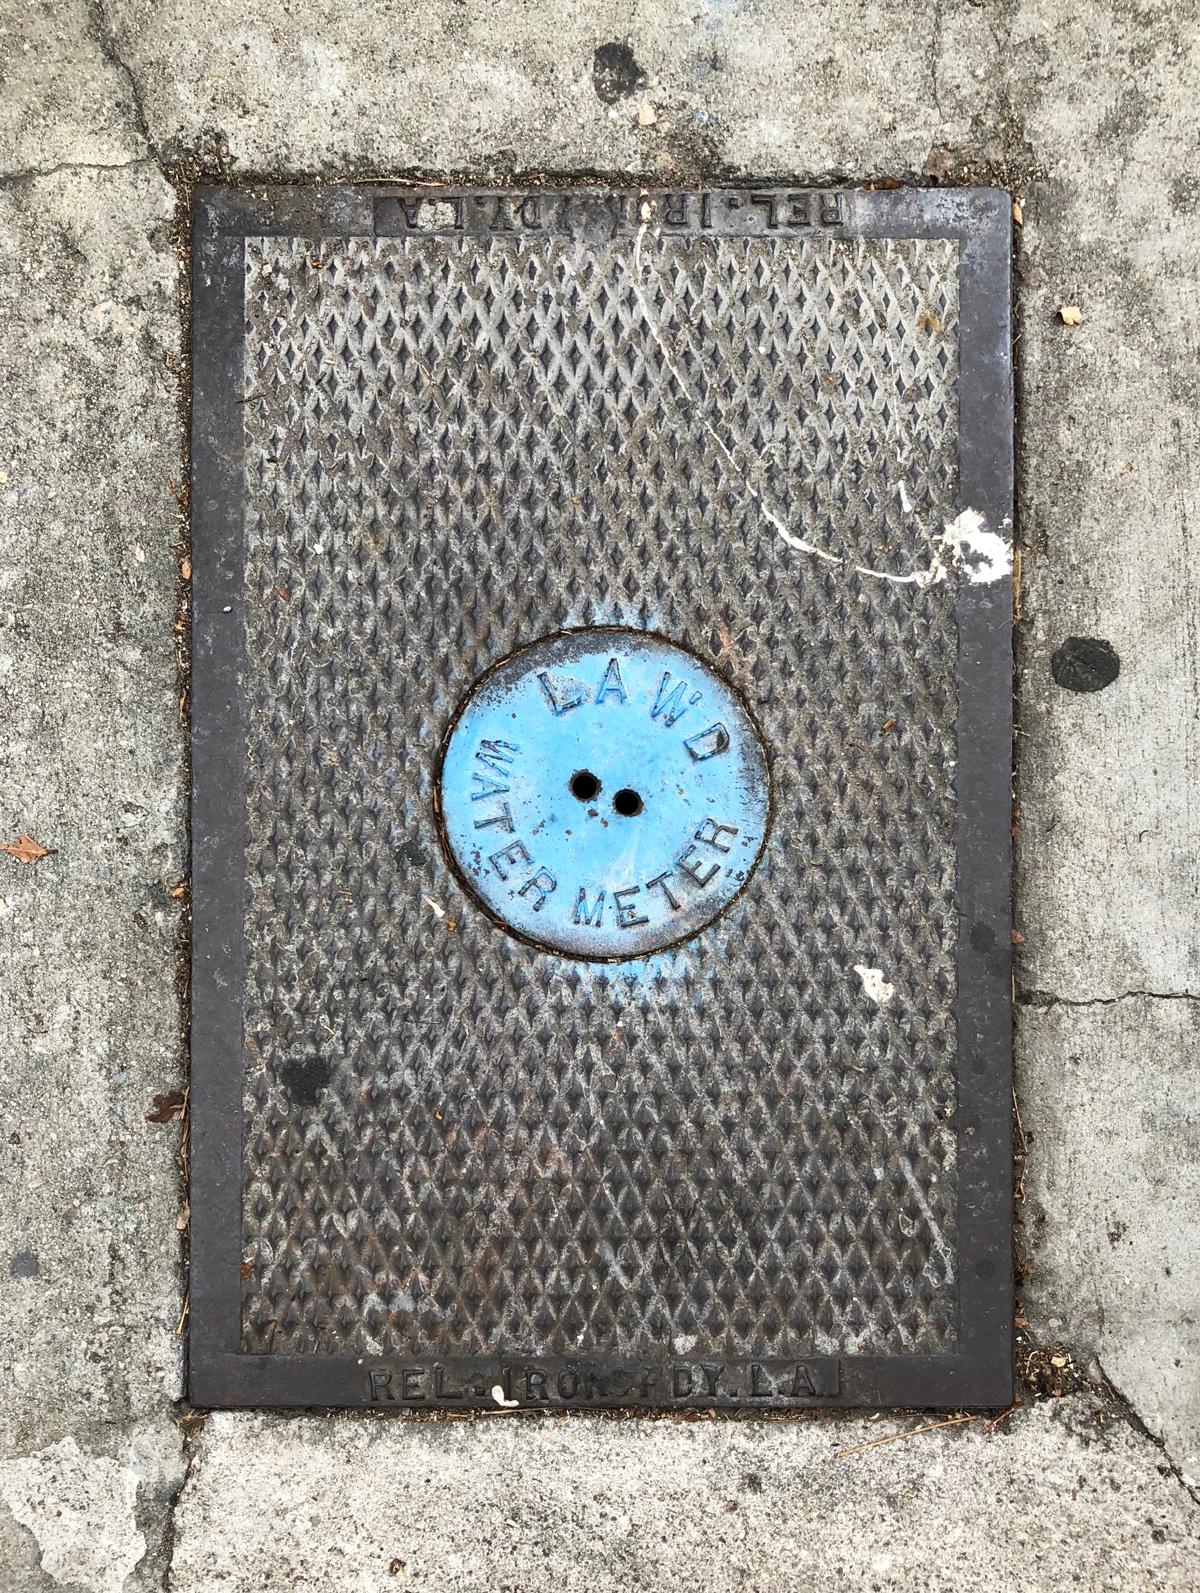 LAWD Water meter